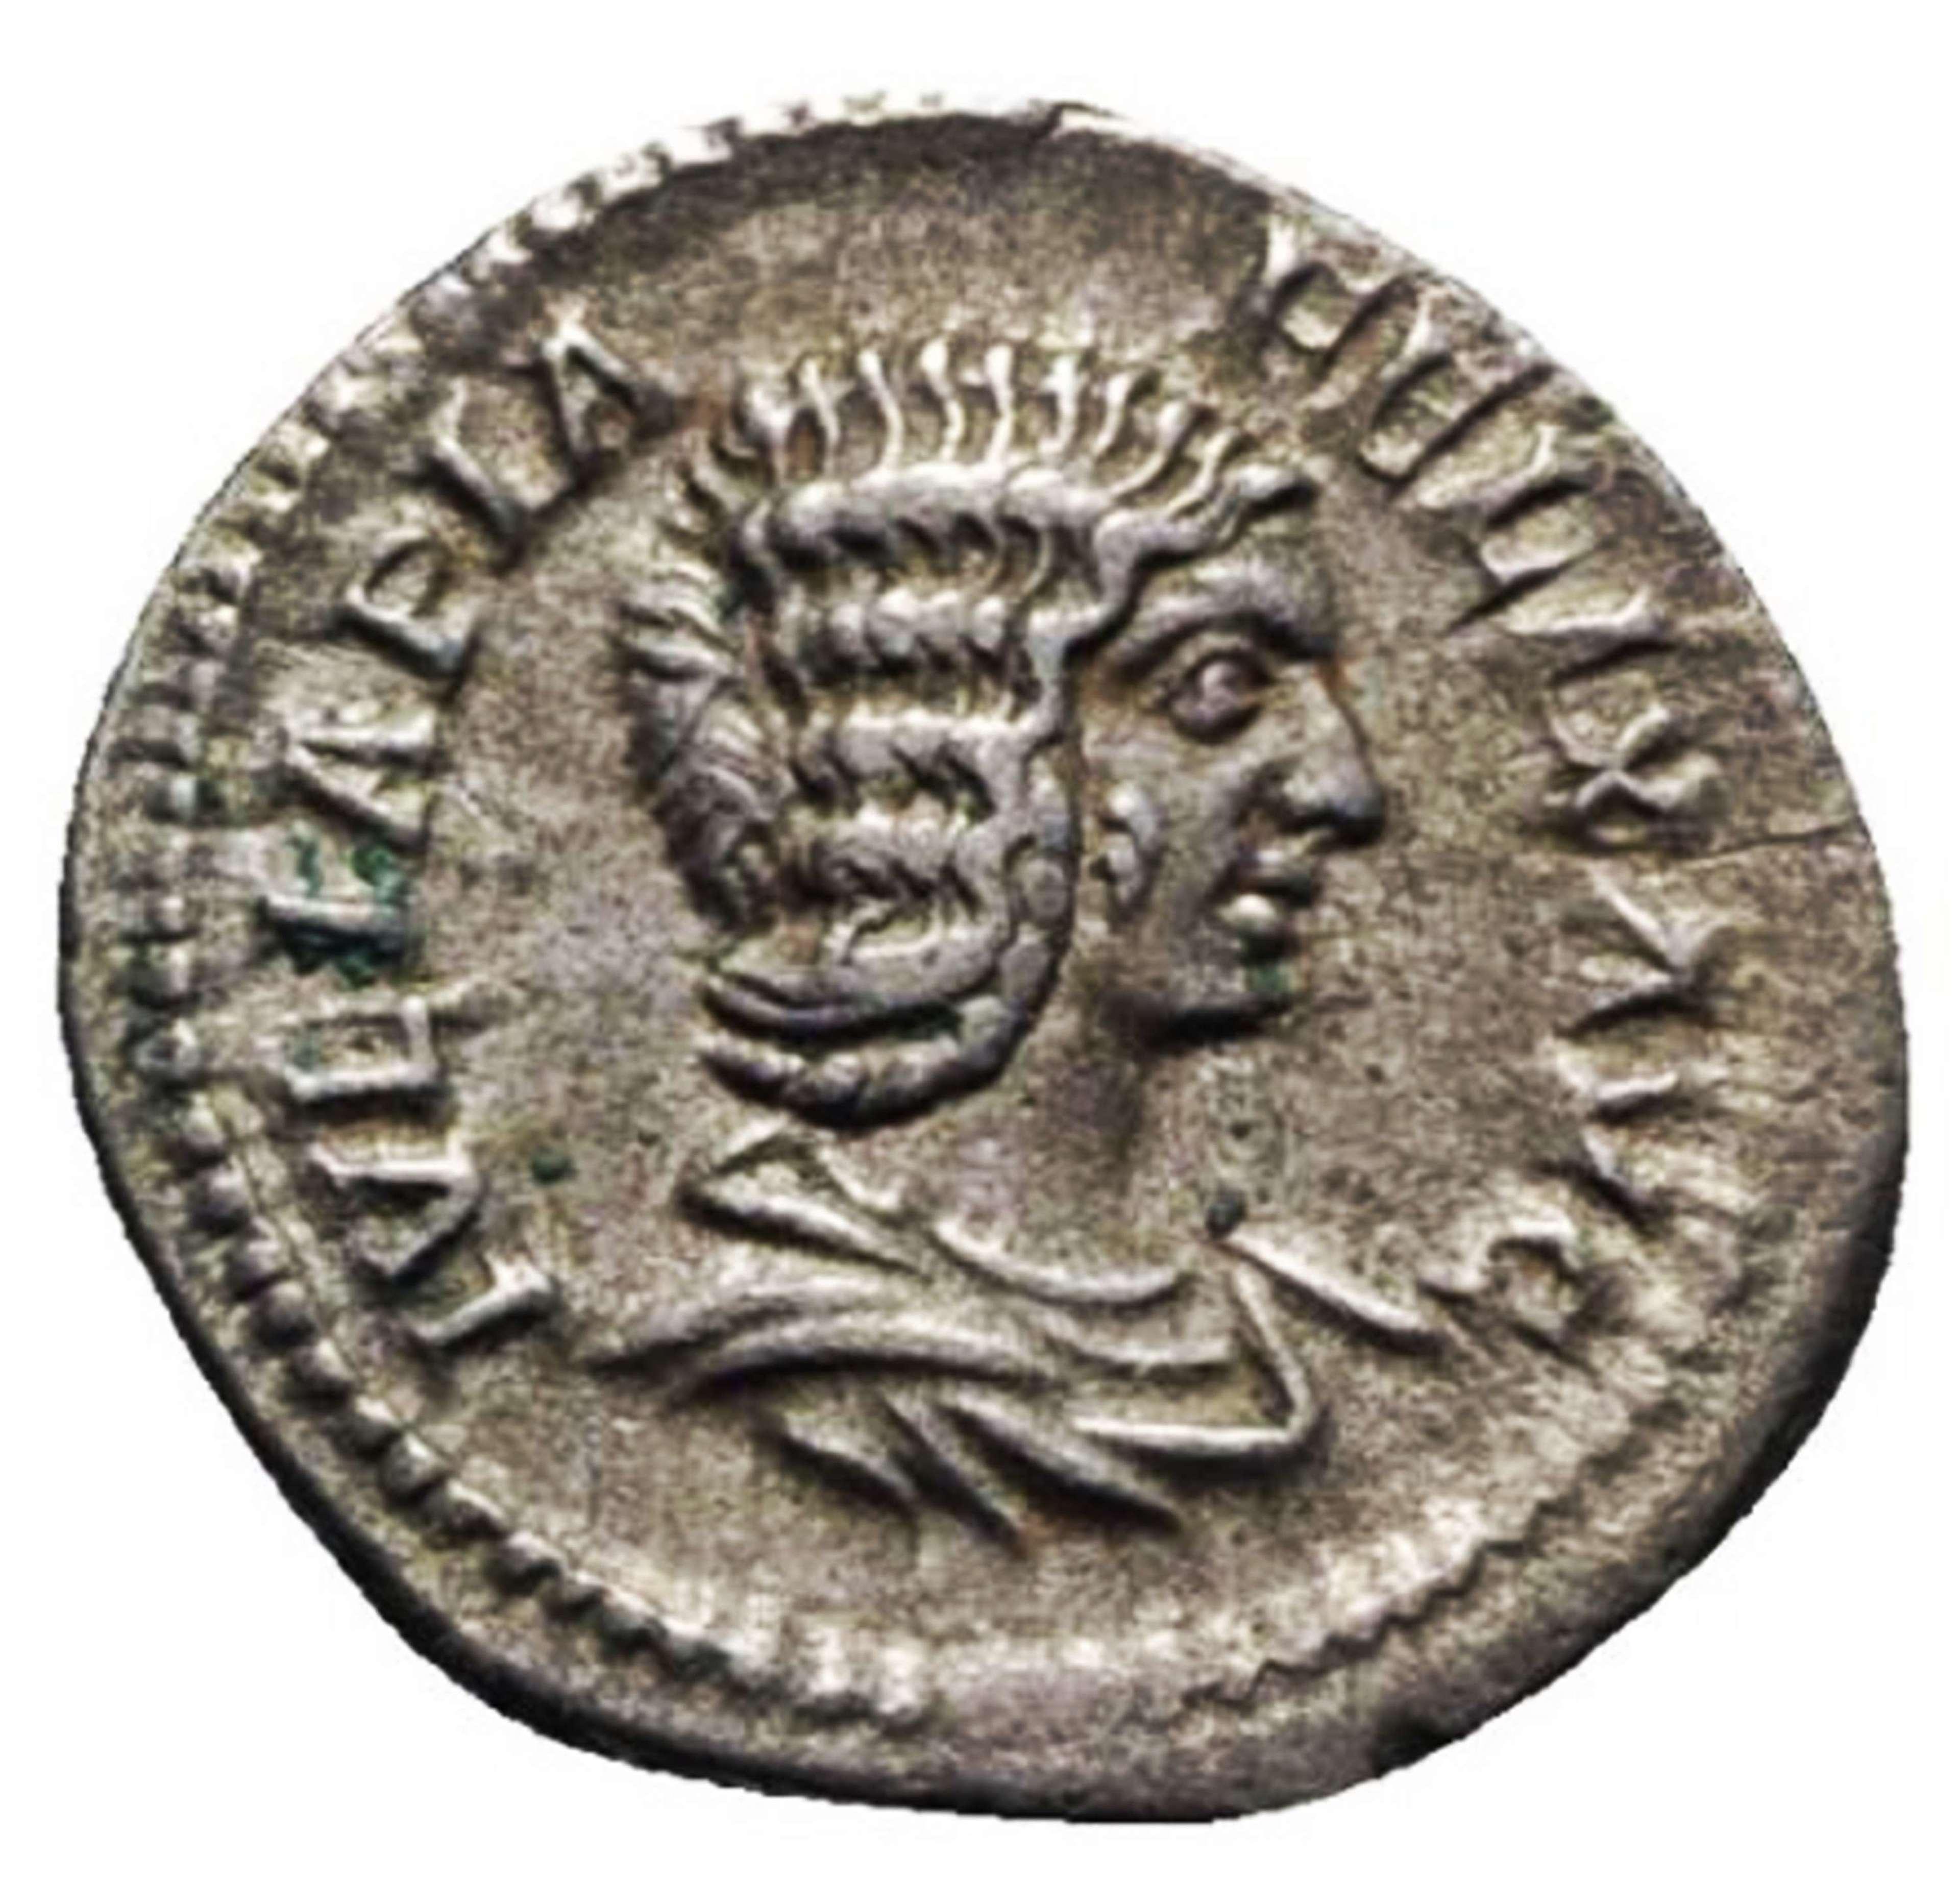 Ancient Roman silver denarius of Julia Domna / Diana bringer of light